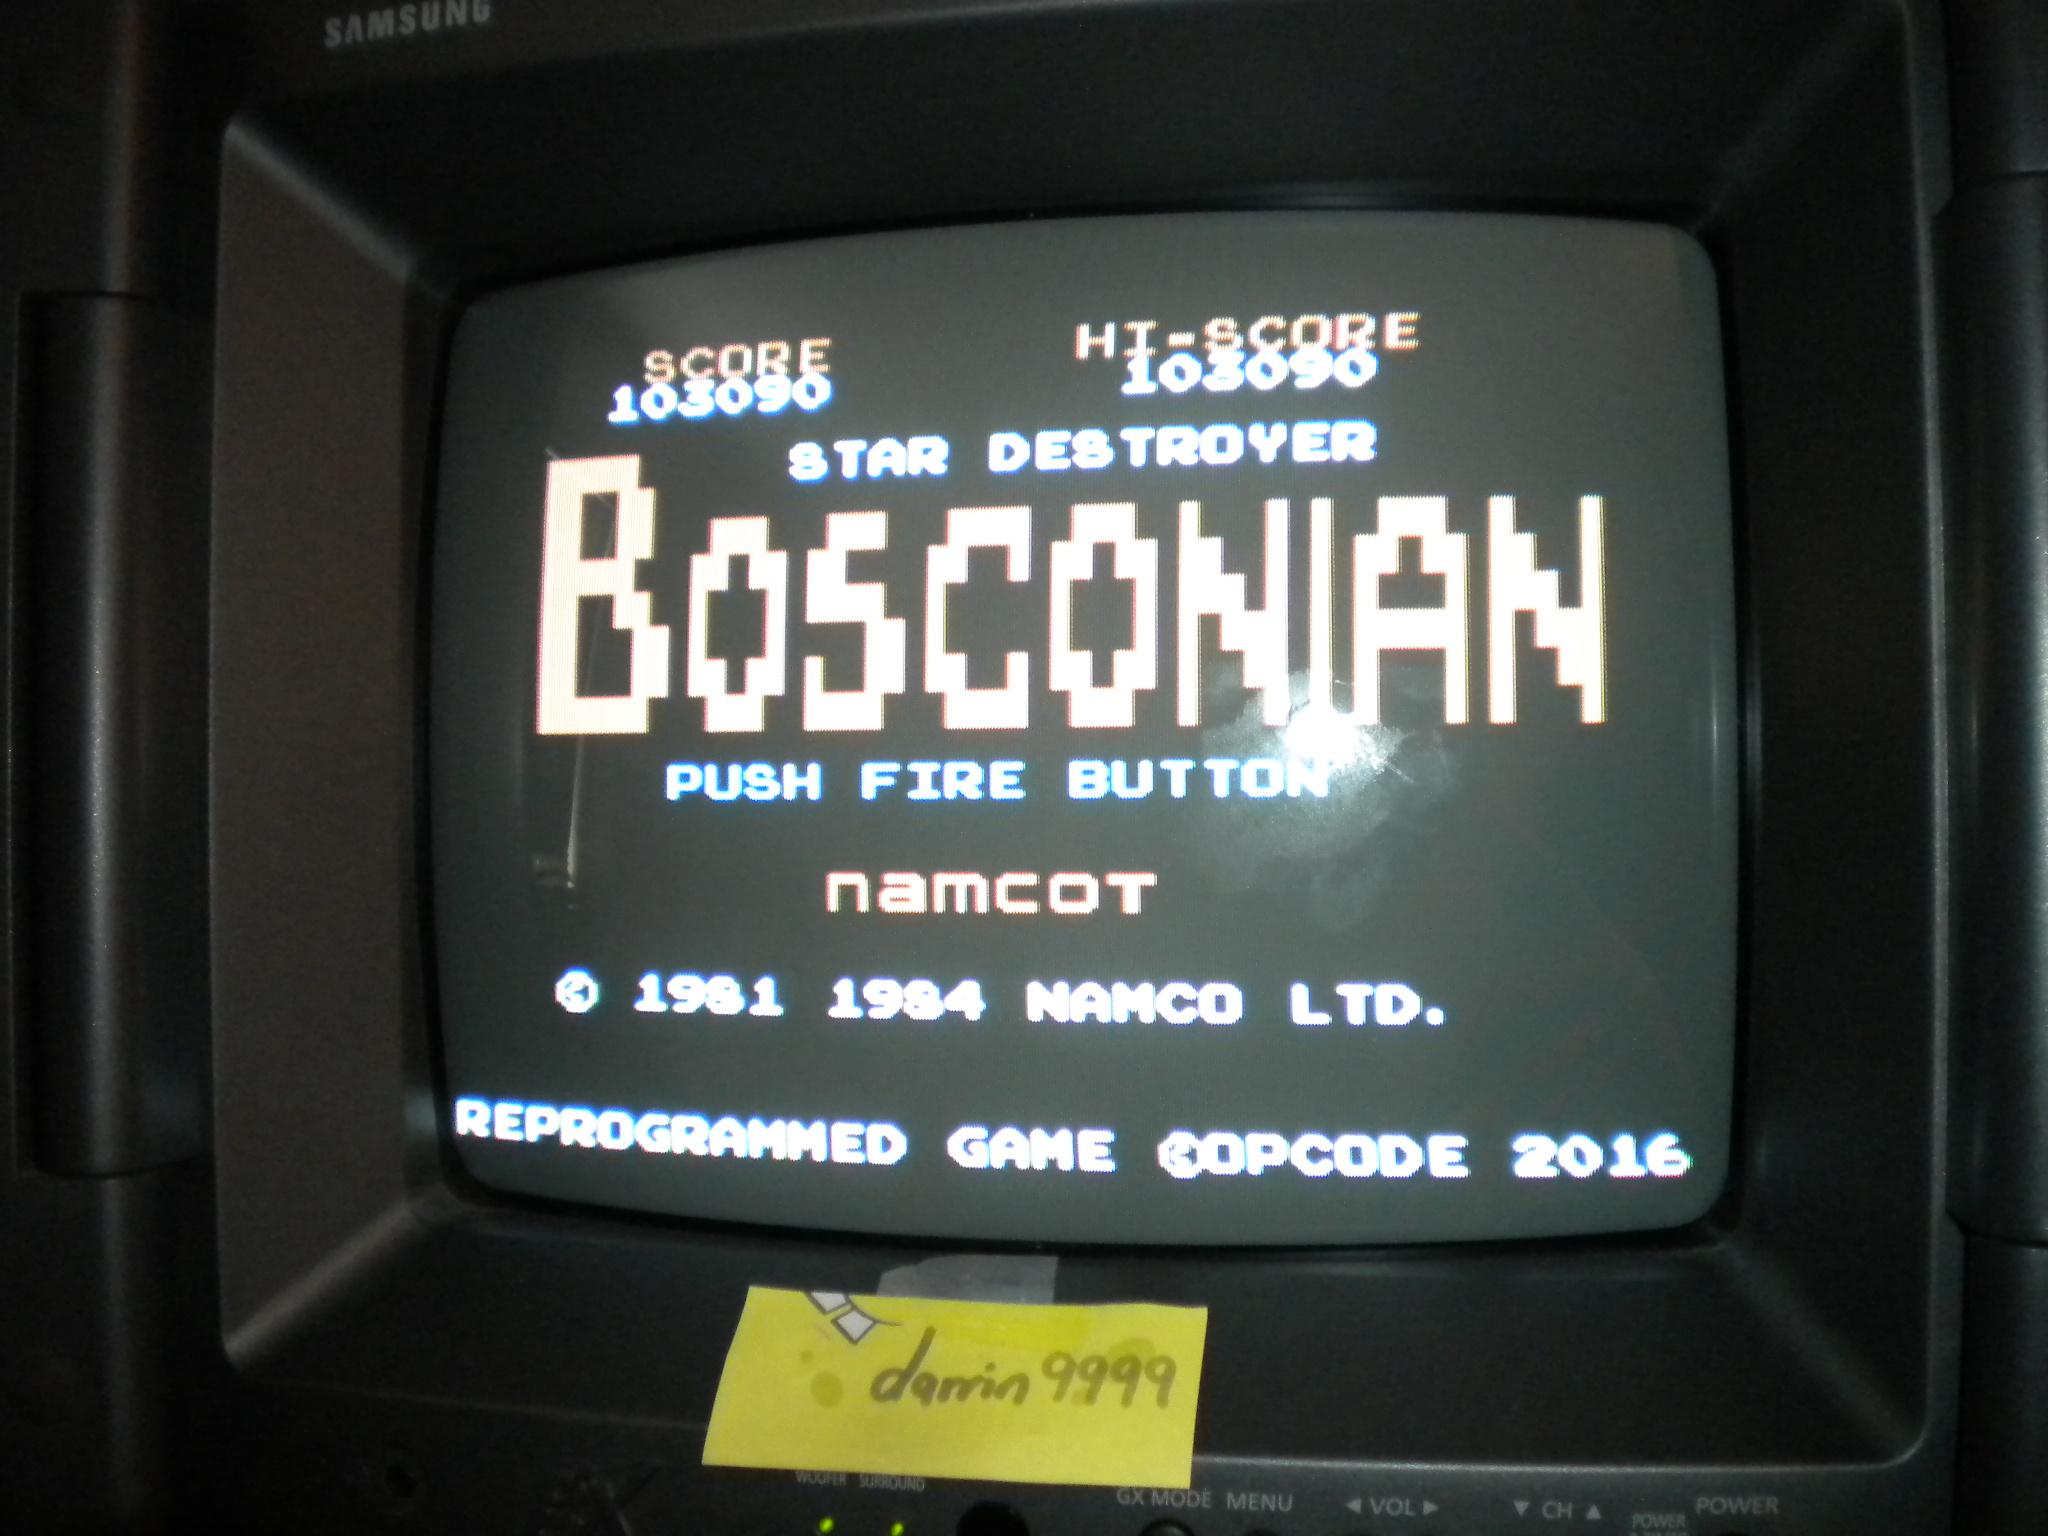 Bosconian 103,090 points